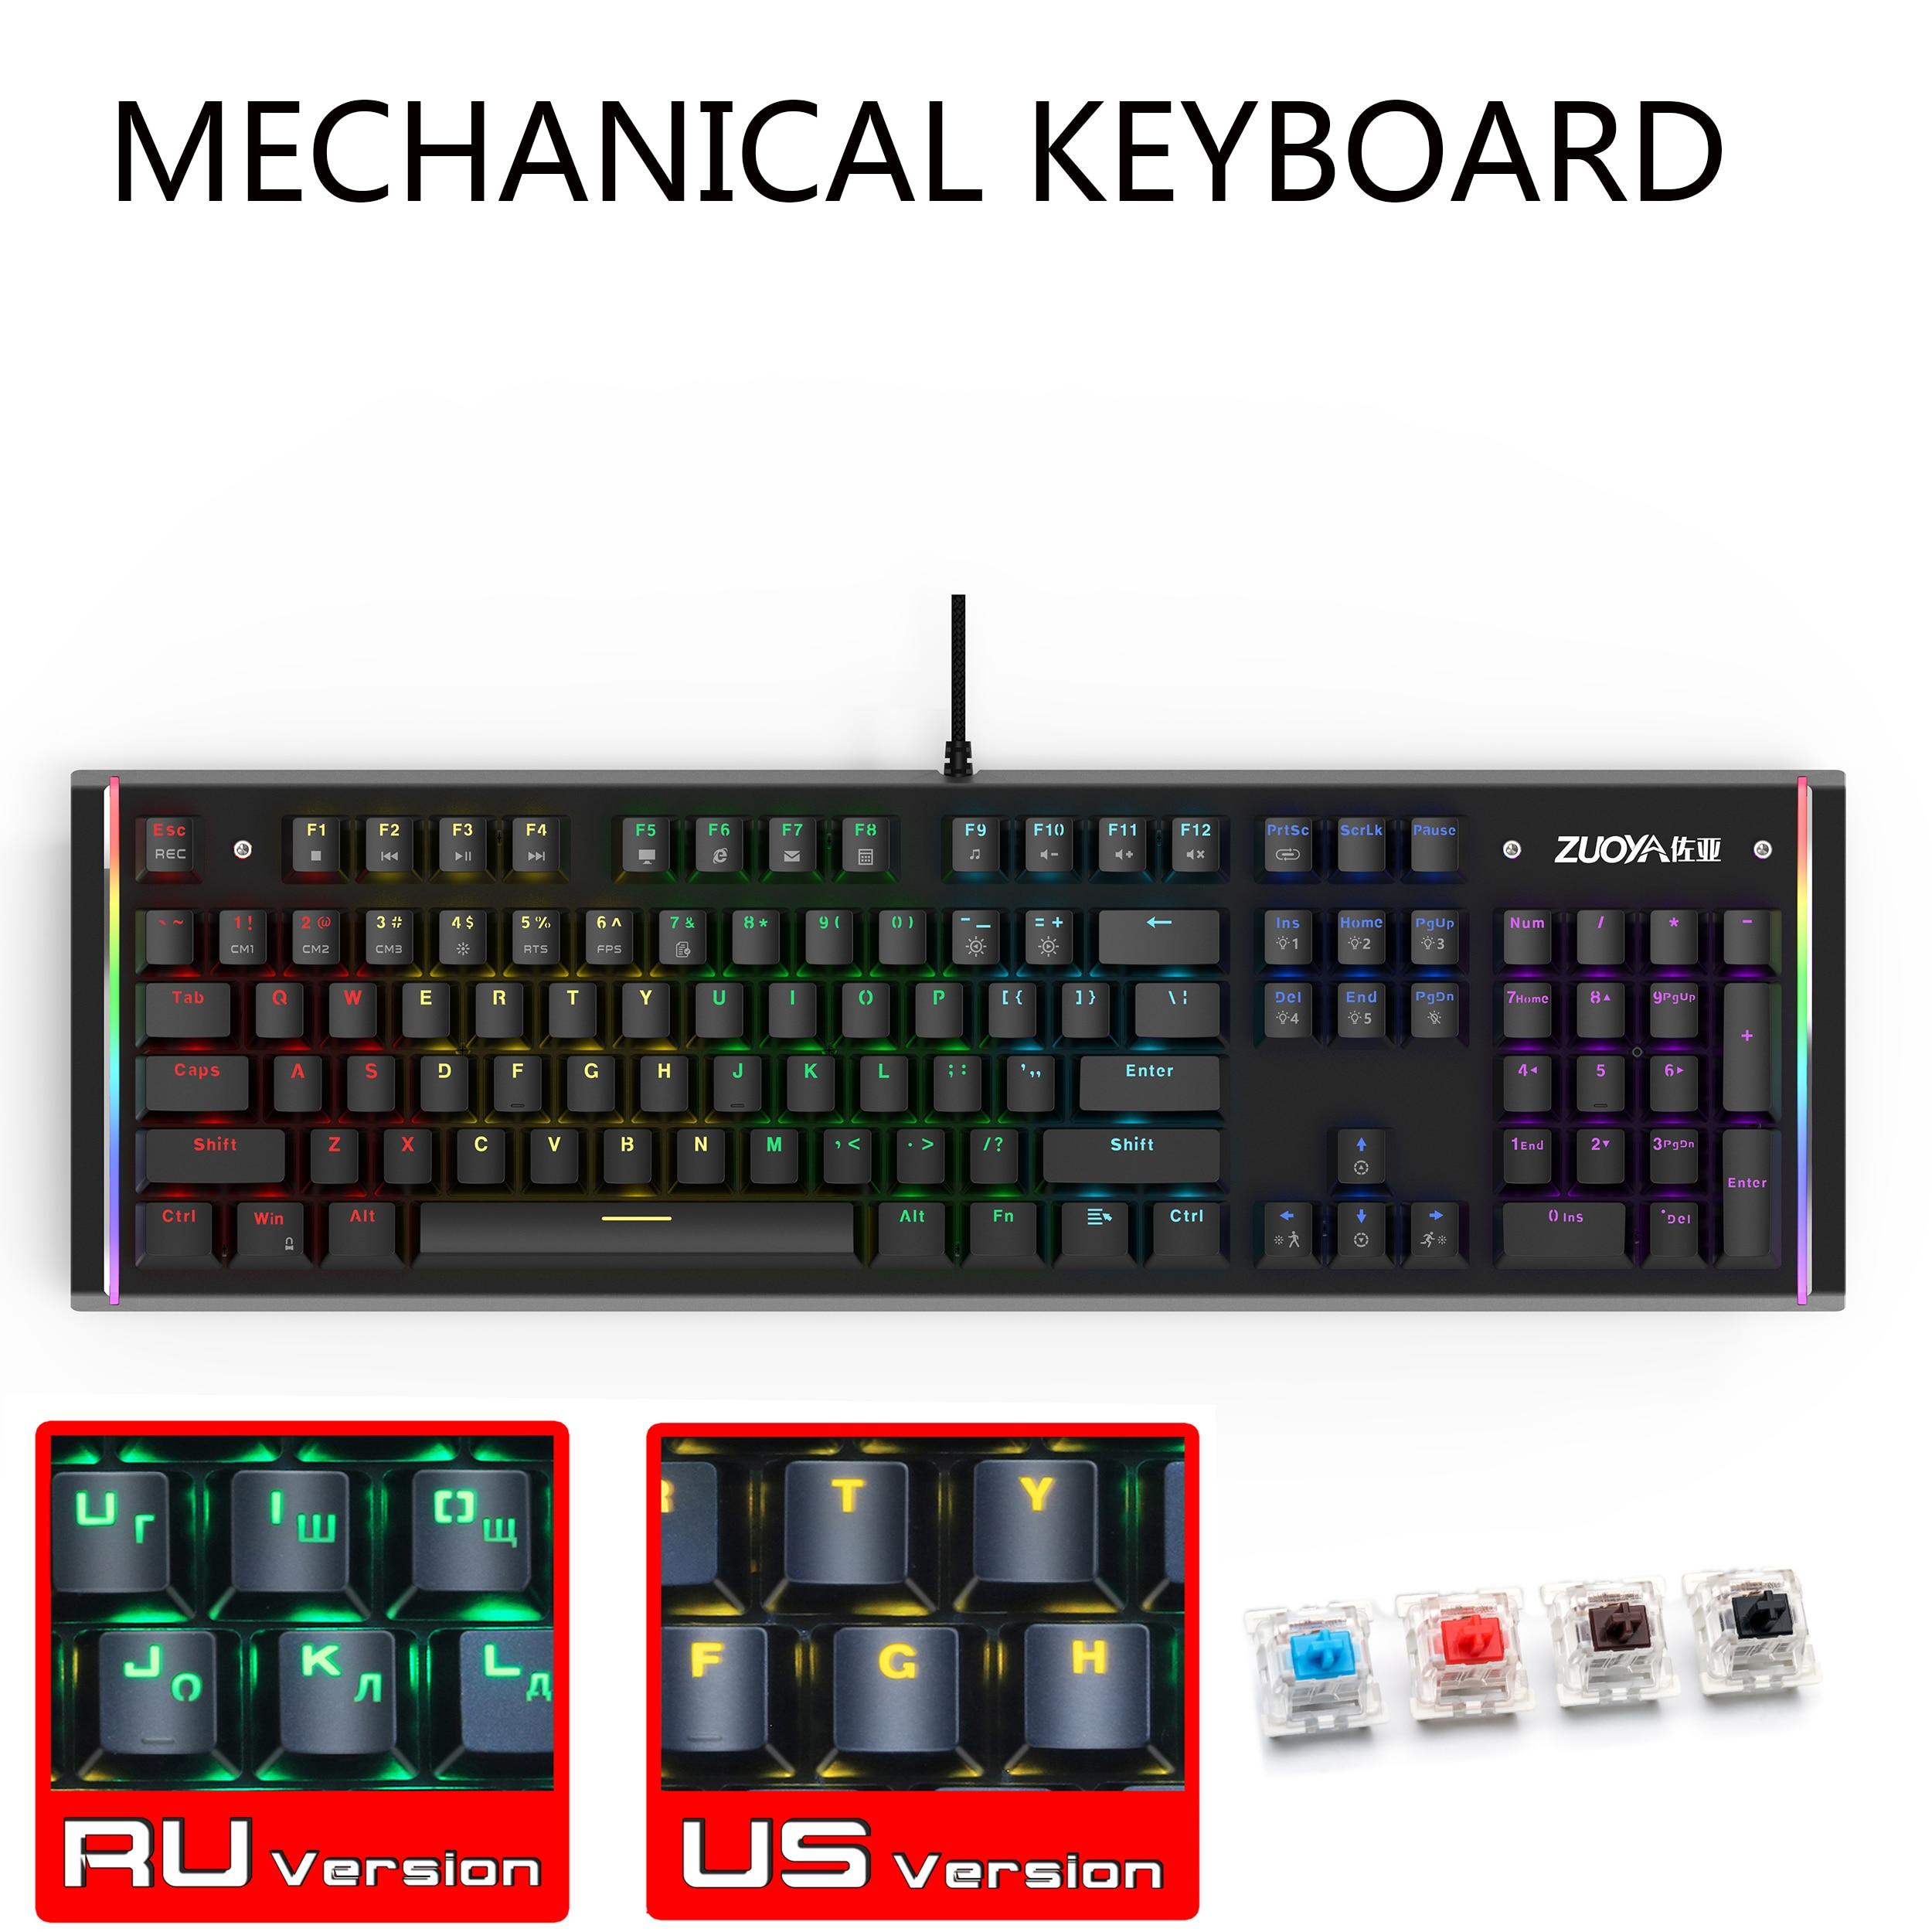 X61 لوحة مفاتيح الألعاب الميكانيكية الإنجليزية/الروسية مفتاح مكافحة الظلال RGB/مزيج USB السلكية ألعاب CS LOL كمبيوتر محمول